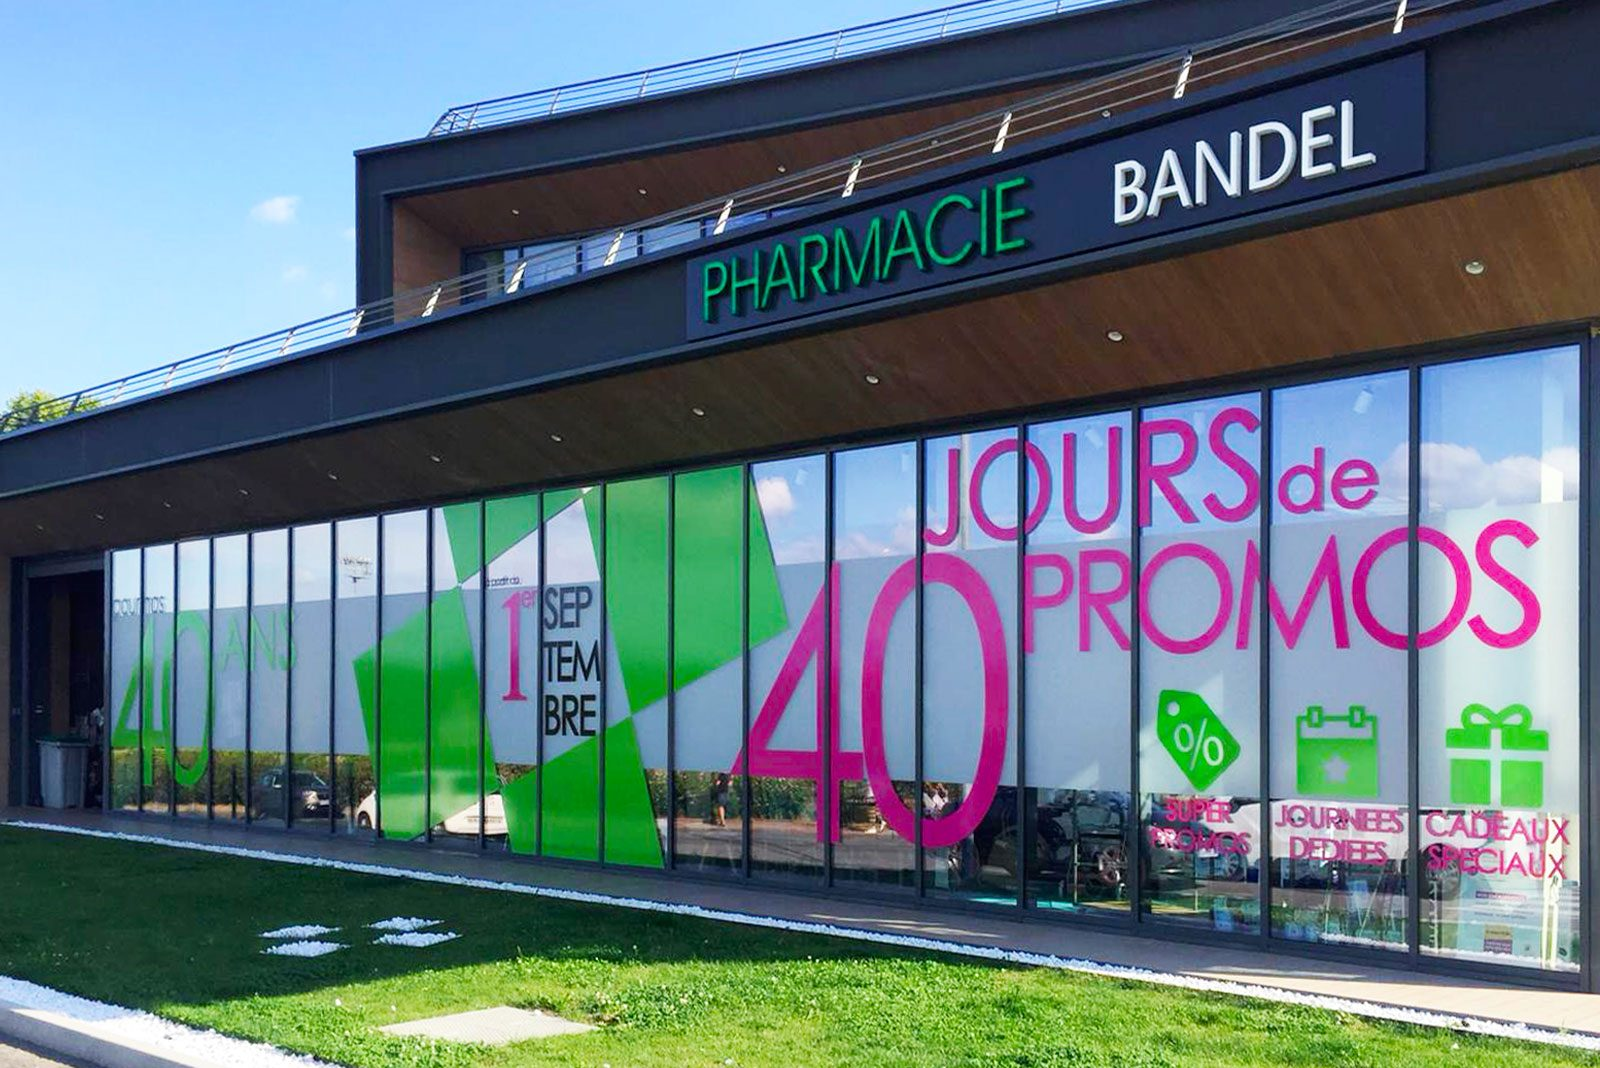 Pharmacie Bandel celebrates its 40th anniversary!